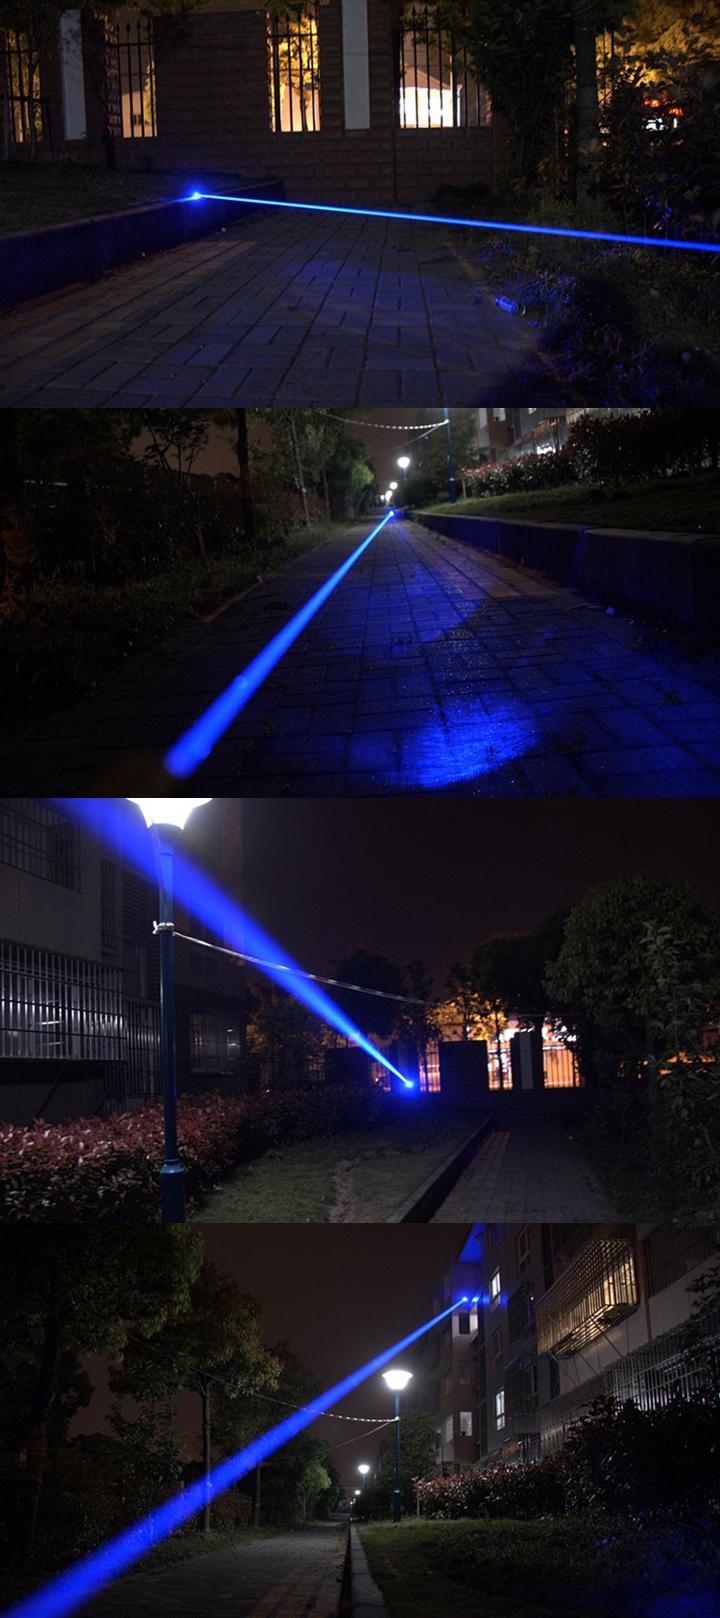 2000mW laserpen